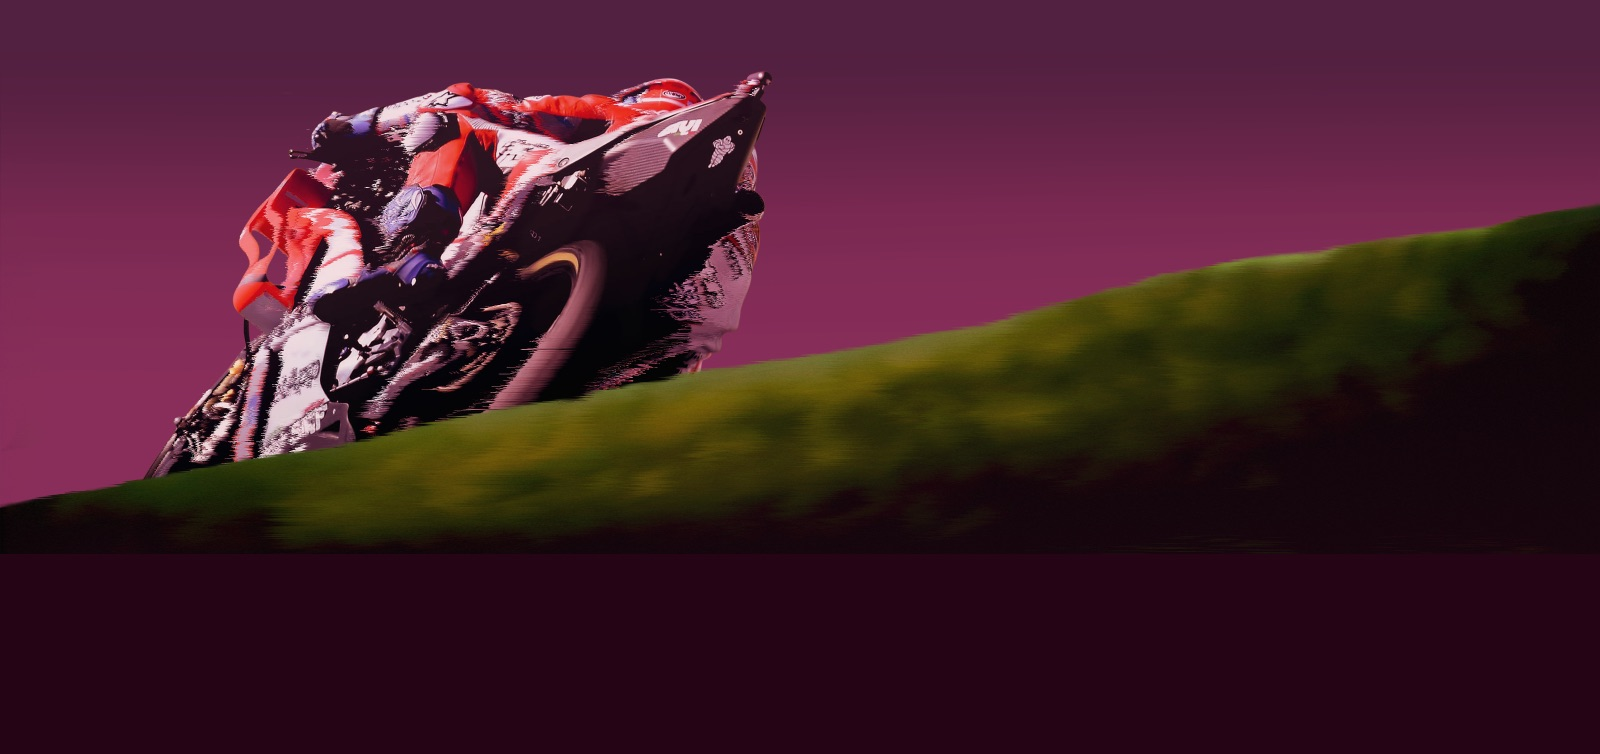 MotoGP19 Videogame